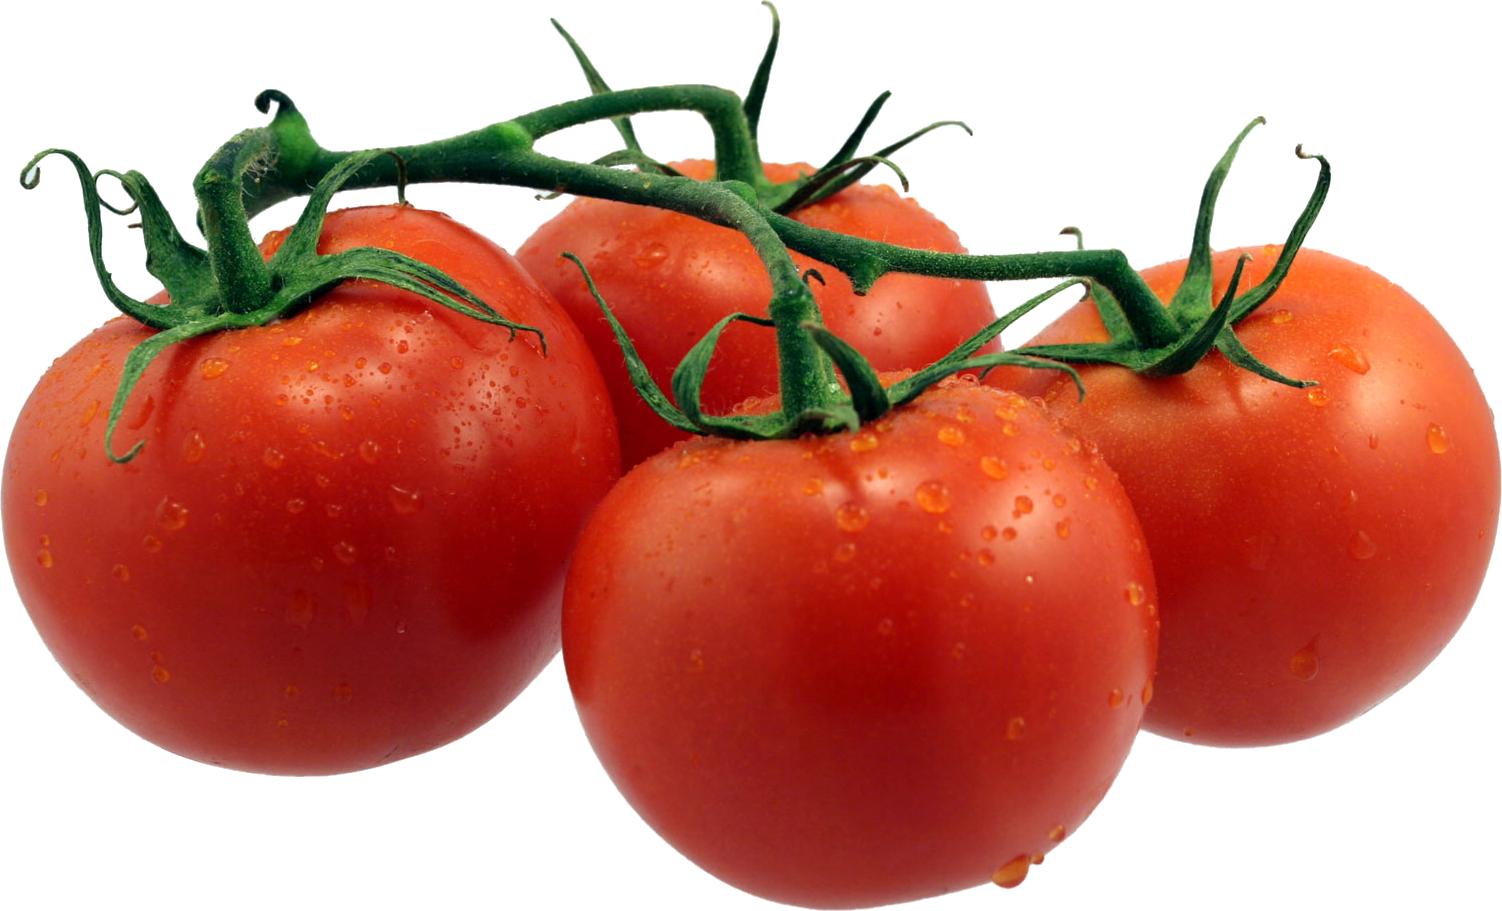 Tomatoe-Tomato.png